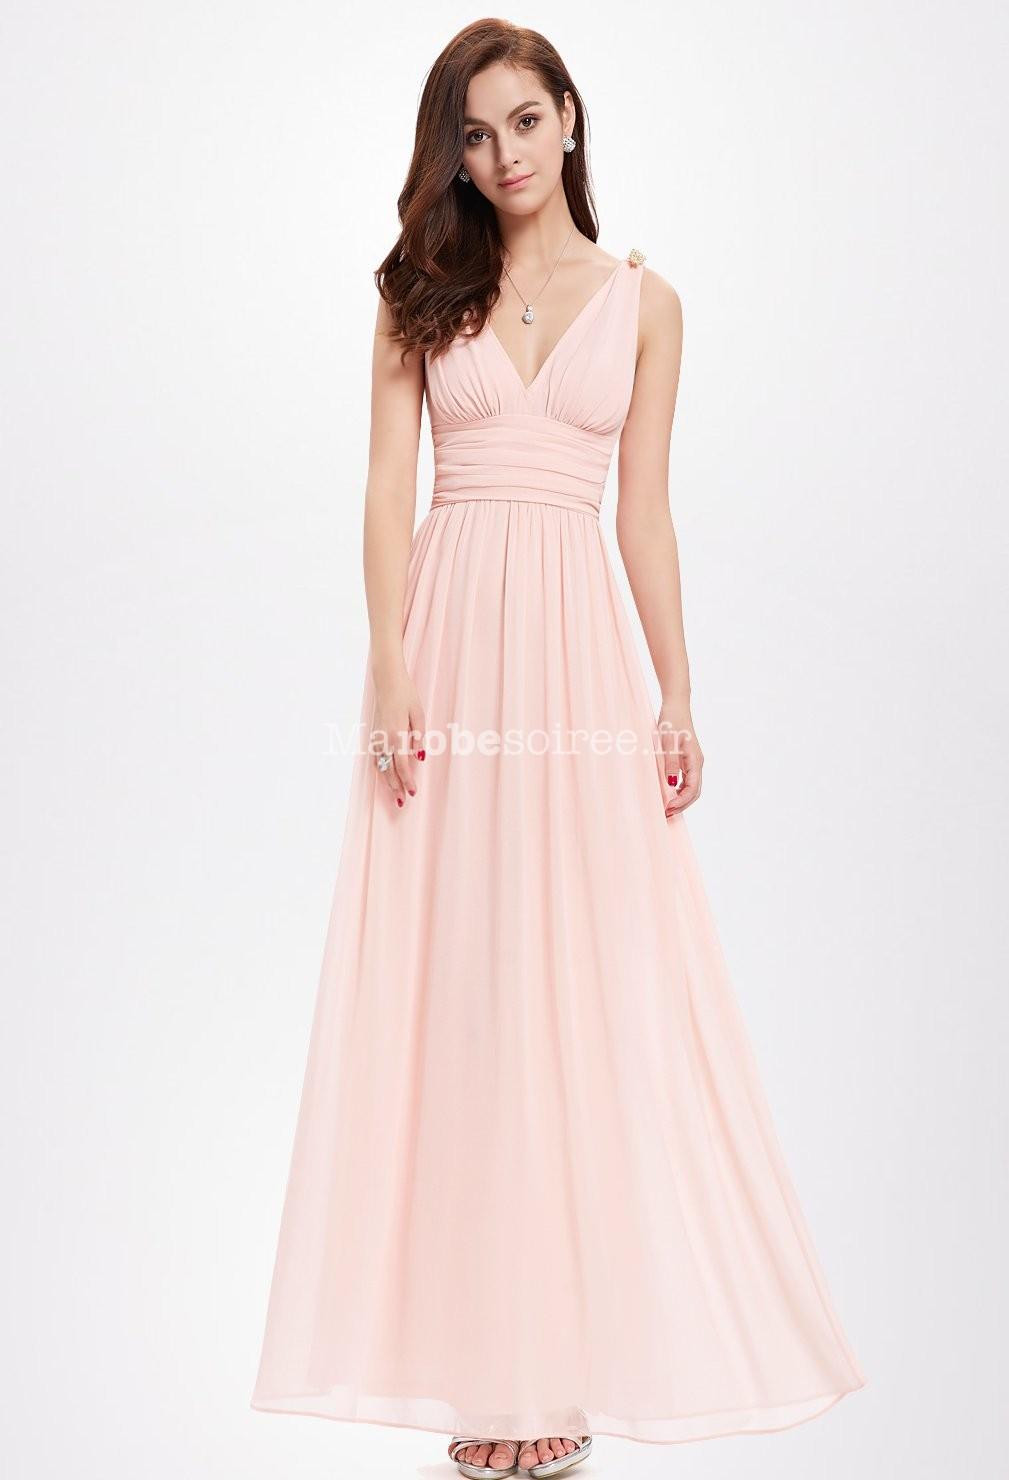 Robe longue en voile rose